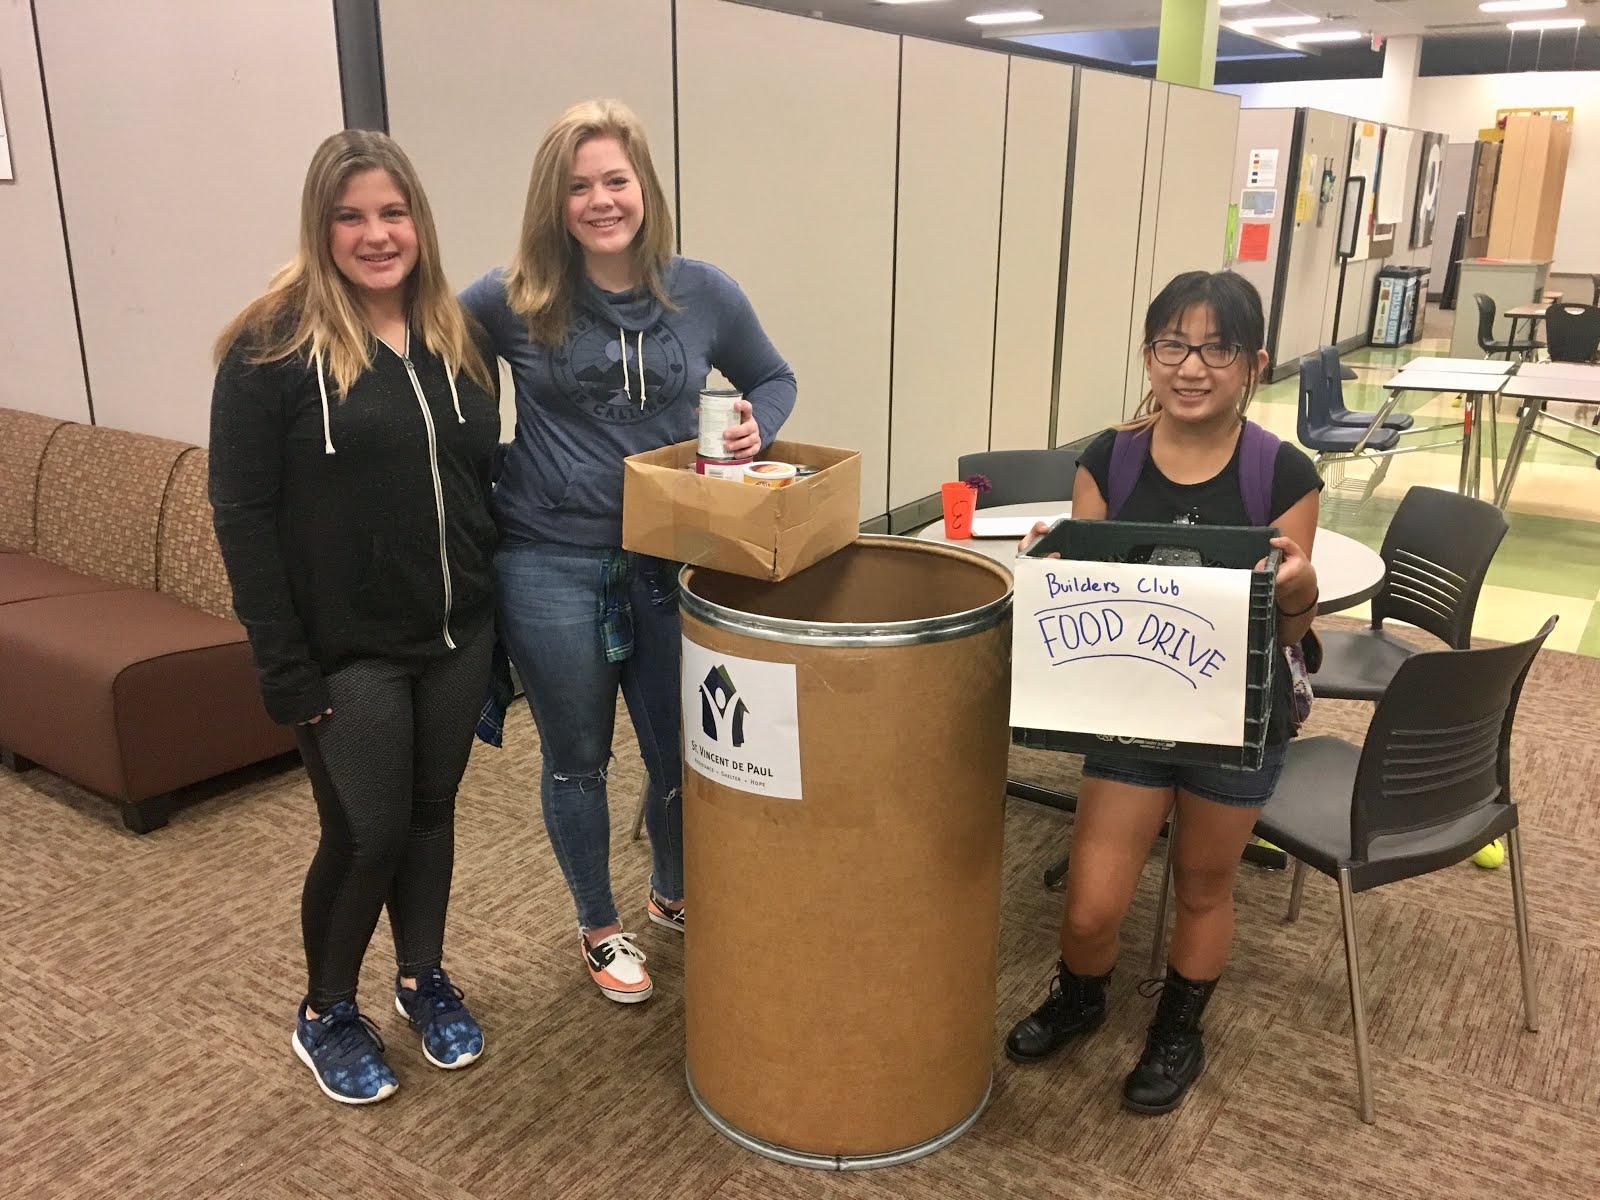 Decision Making Worksheets Stem Kits For High School Students